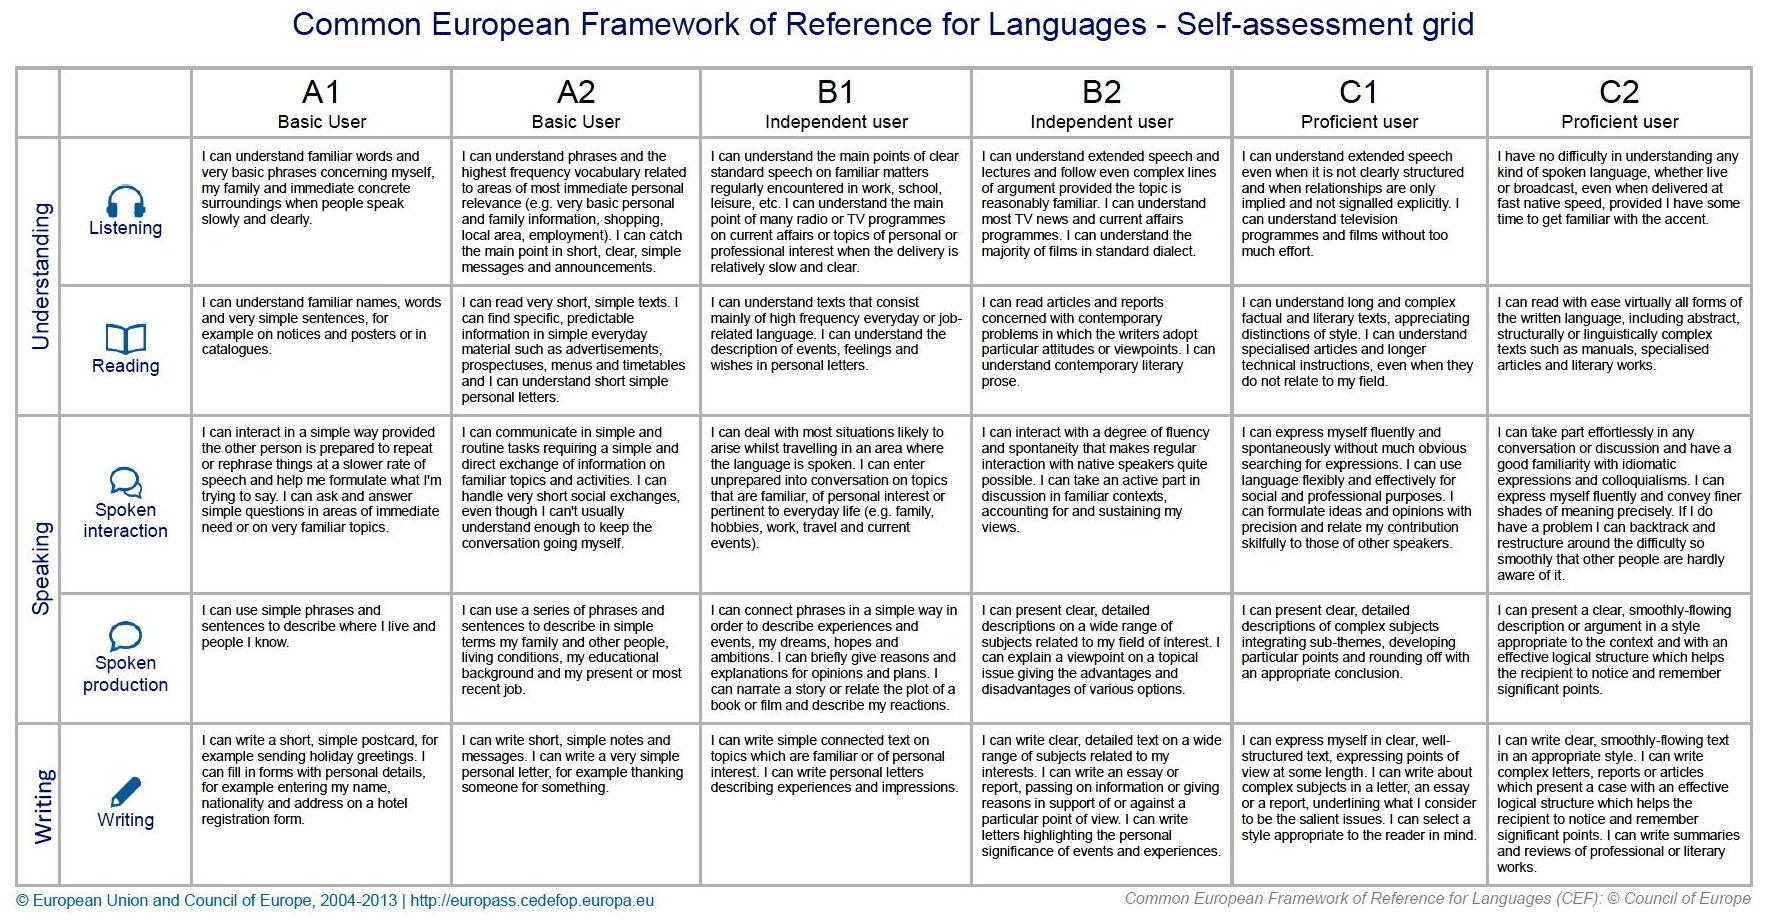 Self-assessment grid